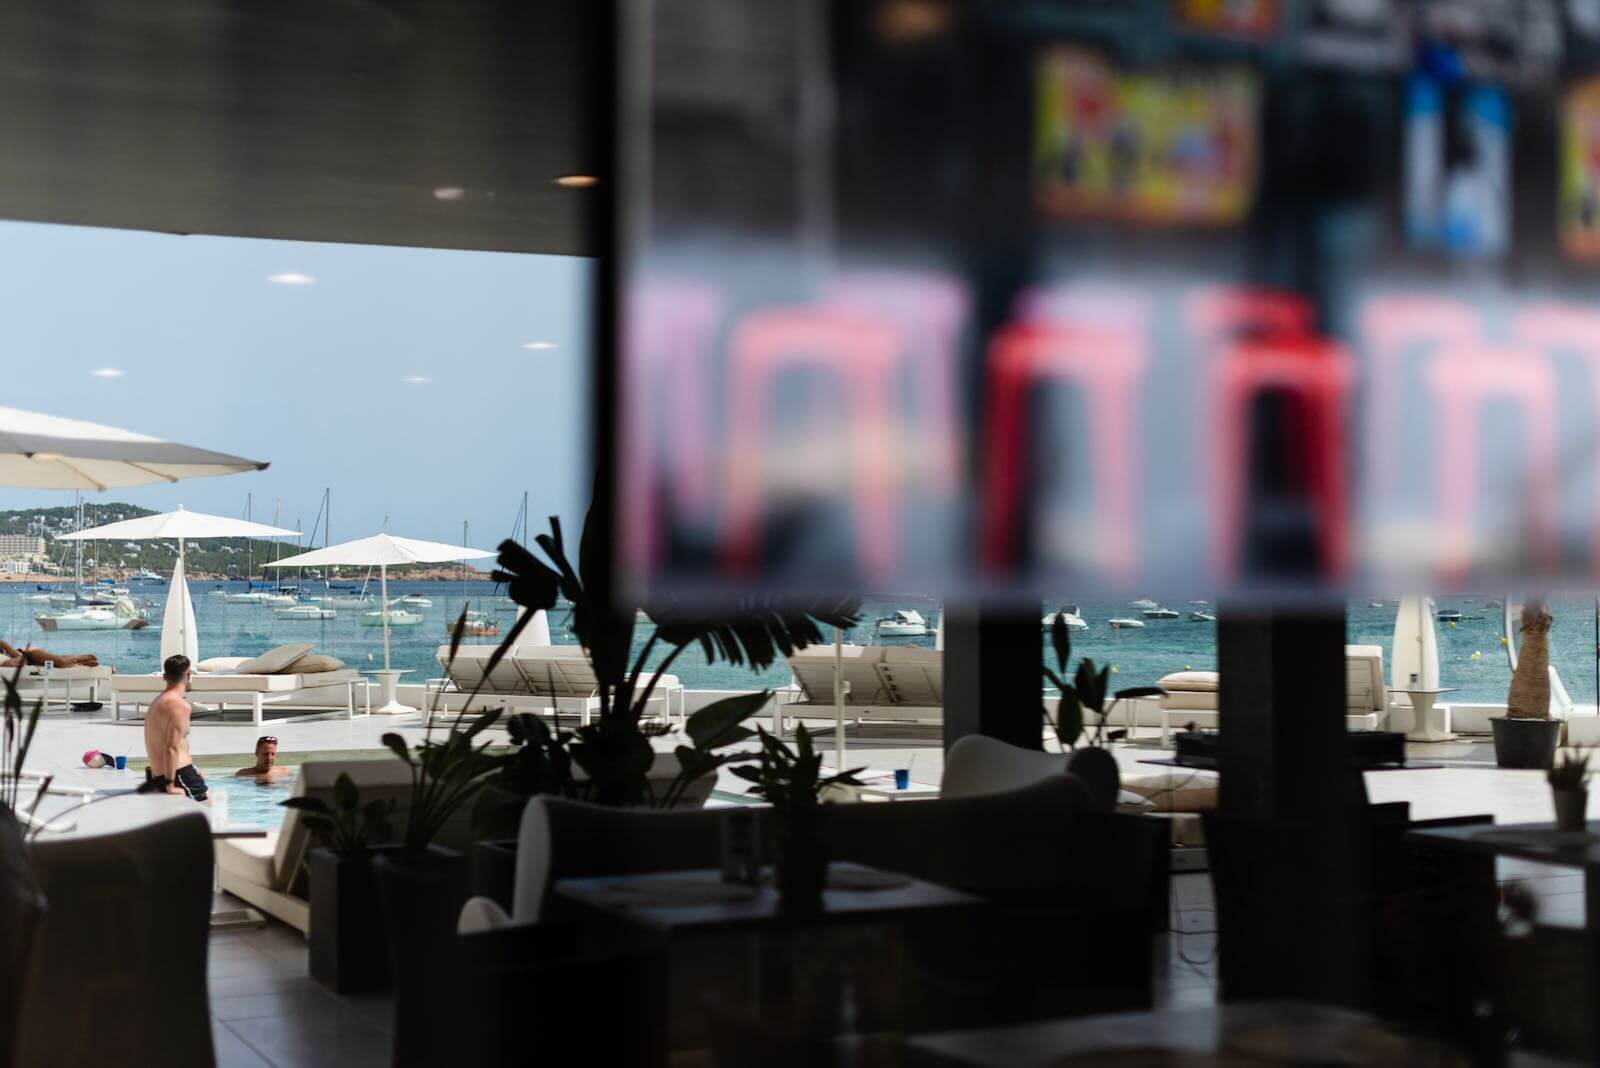 https://www.white-ibiza.com/wp-content/uploads/2020/07/white-ibiza-restaurants-hawker-beach-club-ibiza-2020-12.jpeg